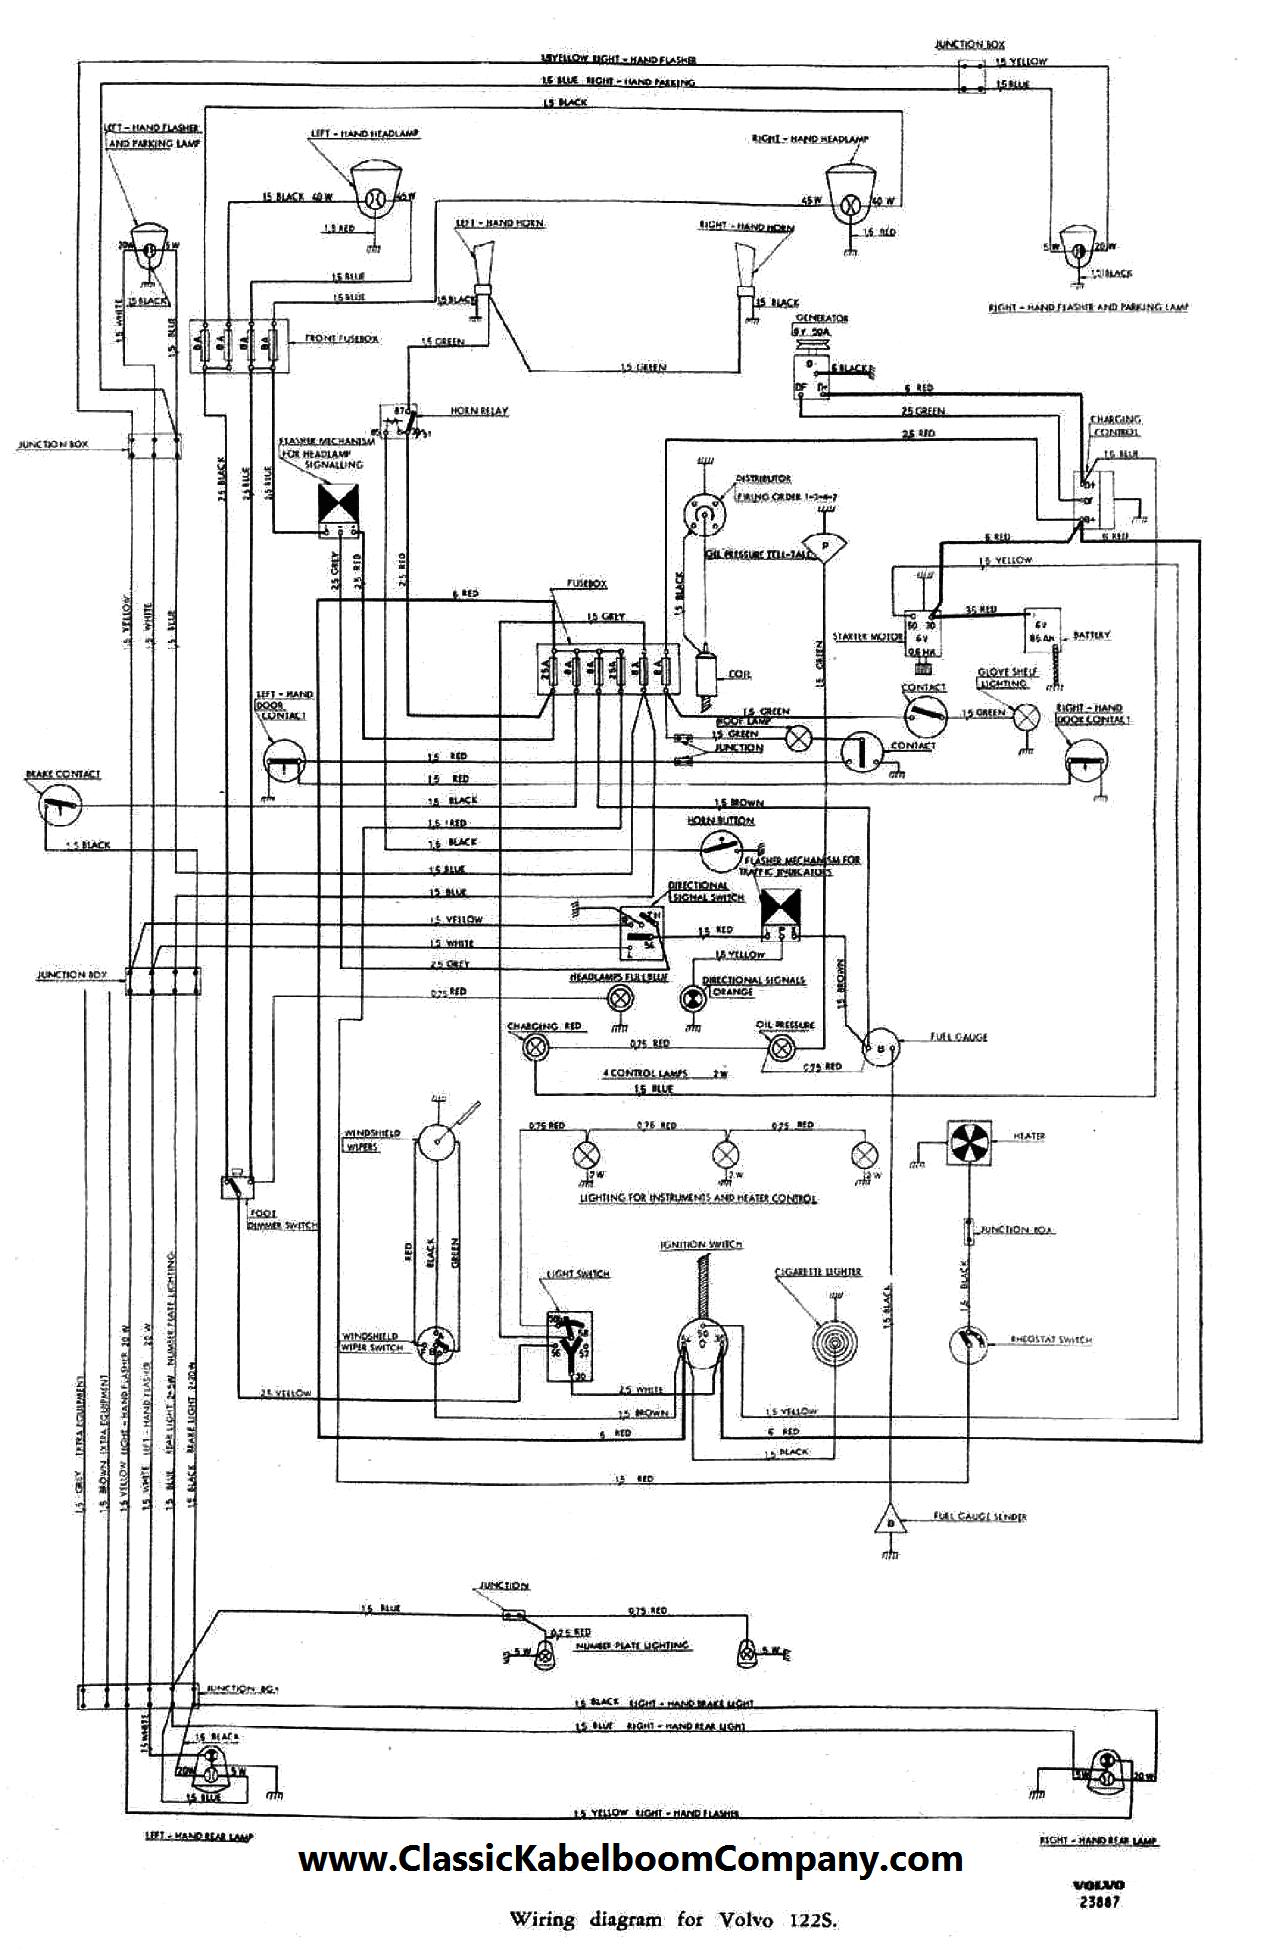 classic kabelboom company elektrisch bedrading schema volvo rh classickabelboomcompany com Volvo V70 Electrical Diagram Audio Wire Diagram 1985 Volvo